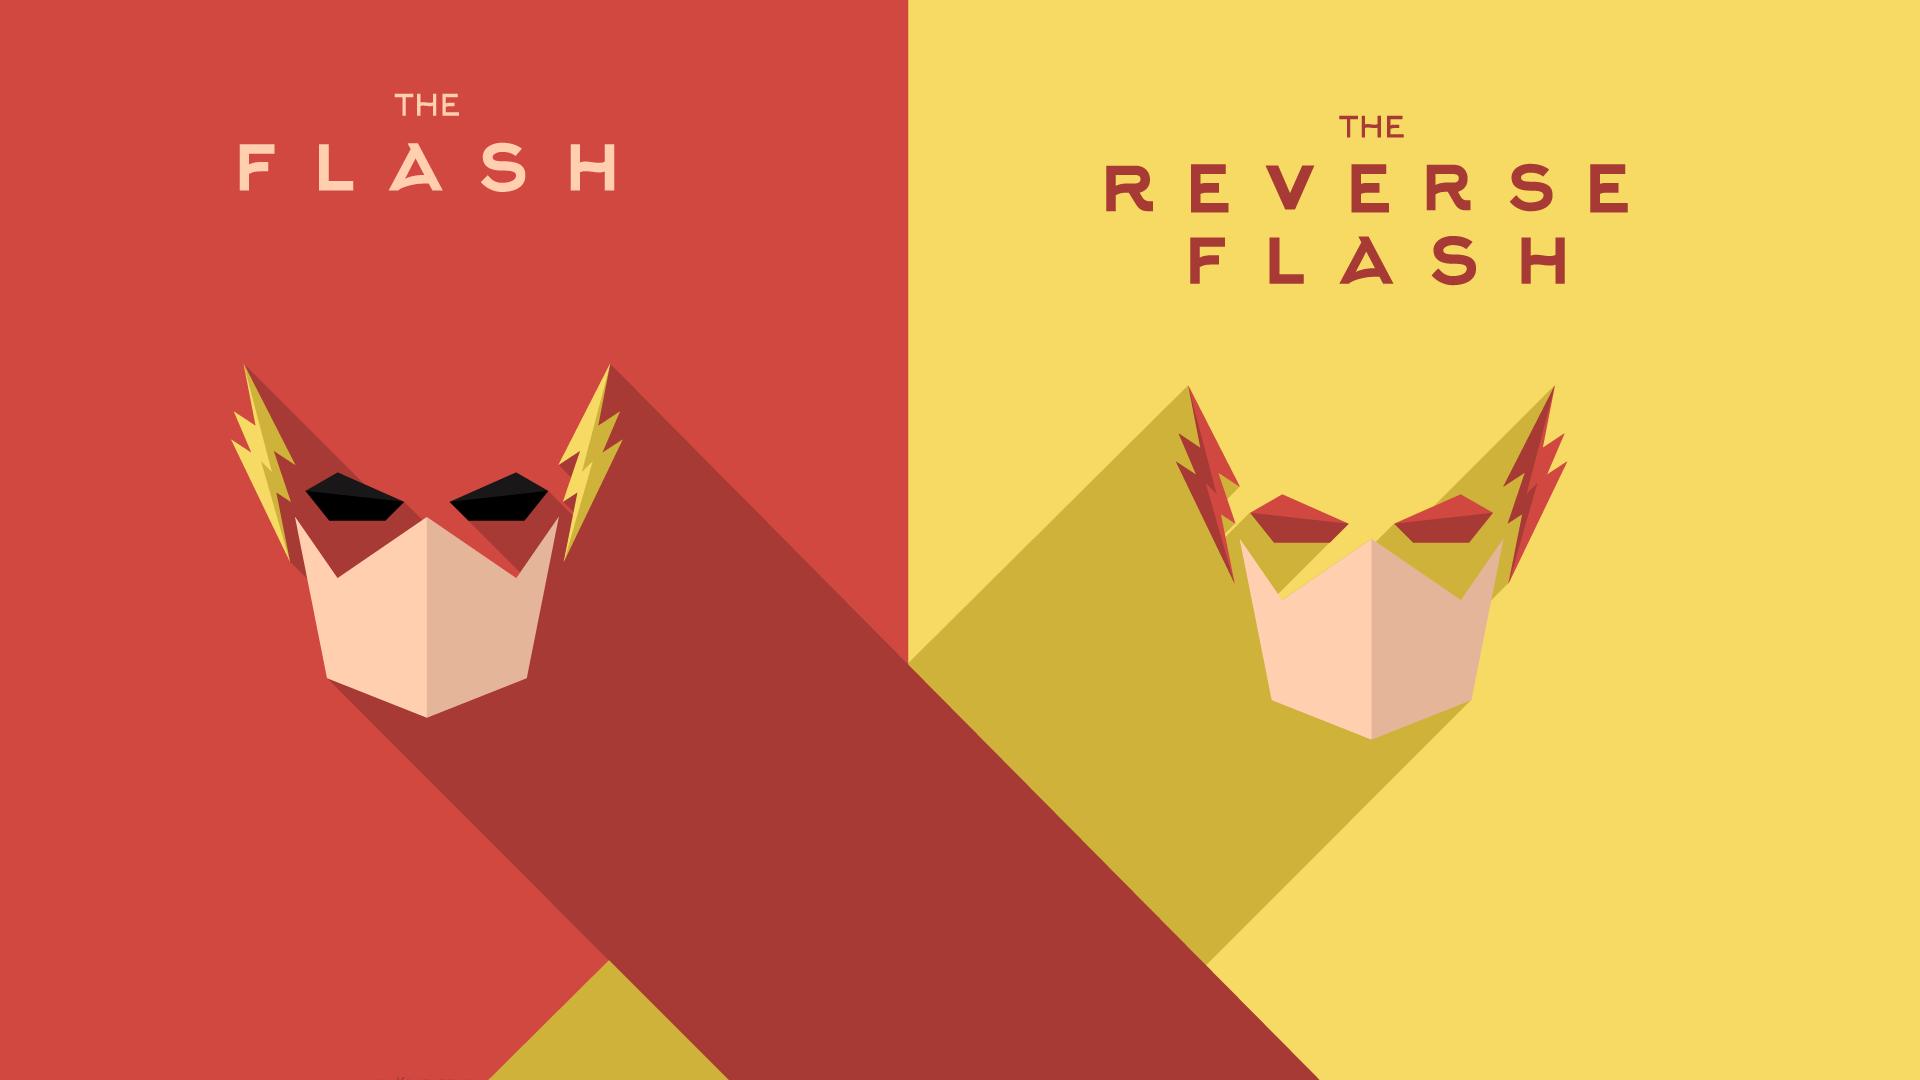 The Flash Wallpaper for PC | Wallpaper Zone